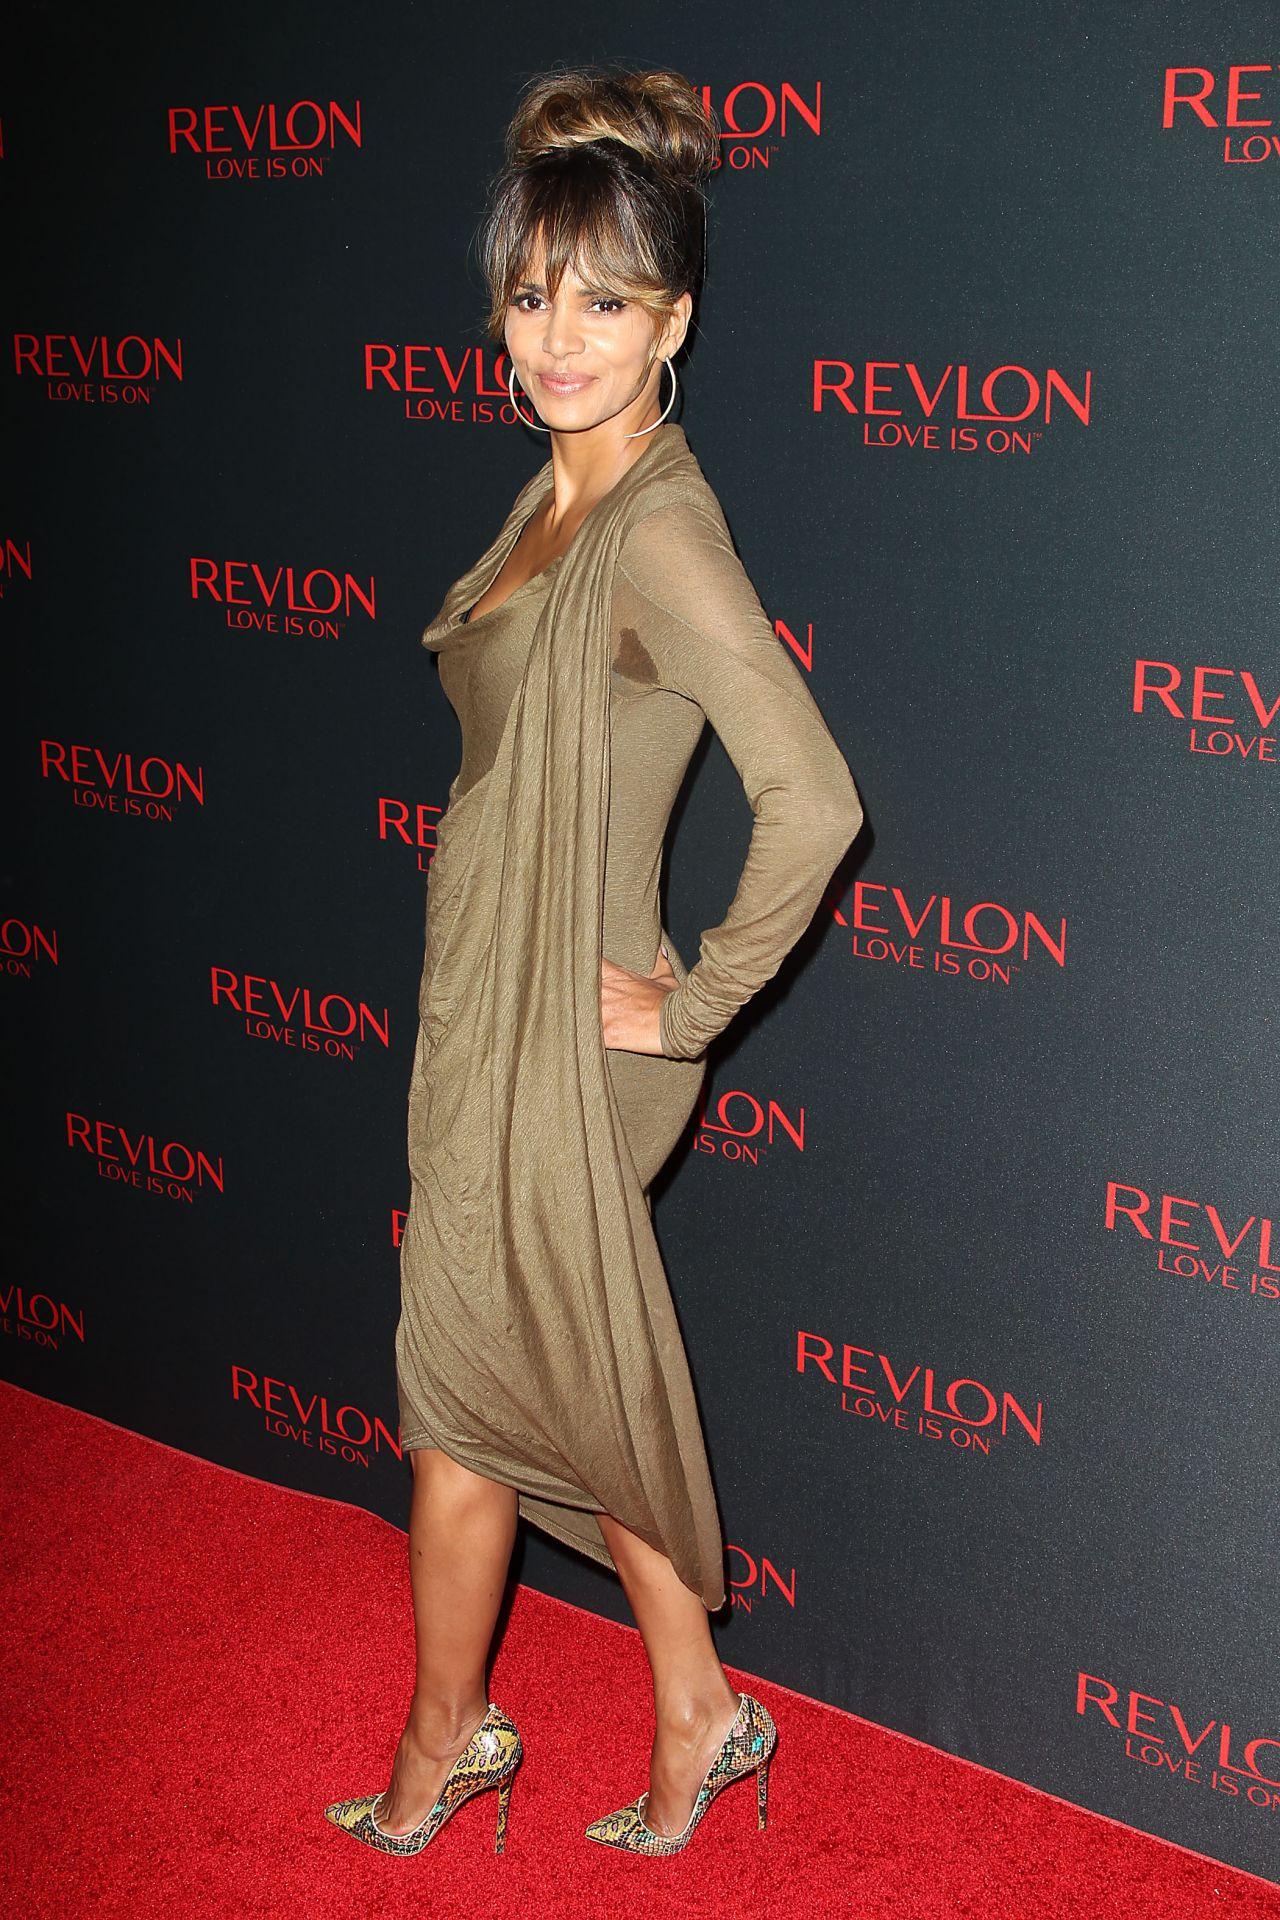 Halle Berry Revlon Love Is On Million Dollar Challenge